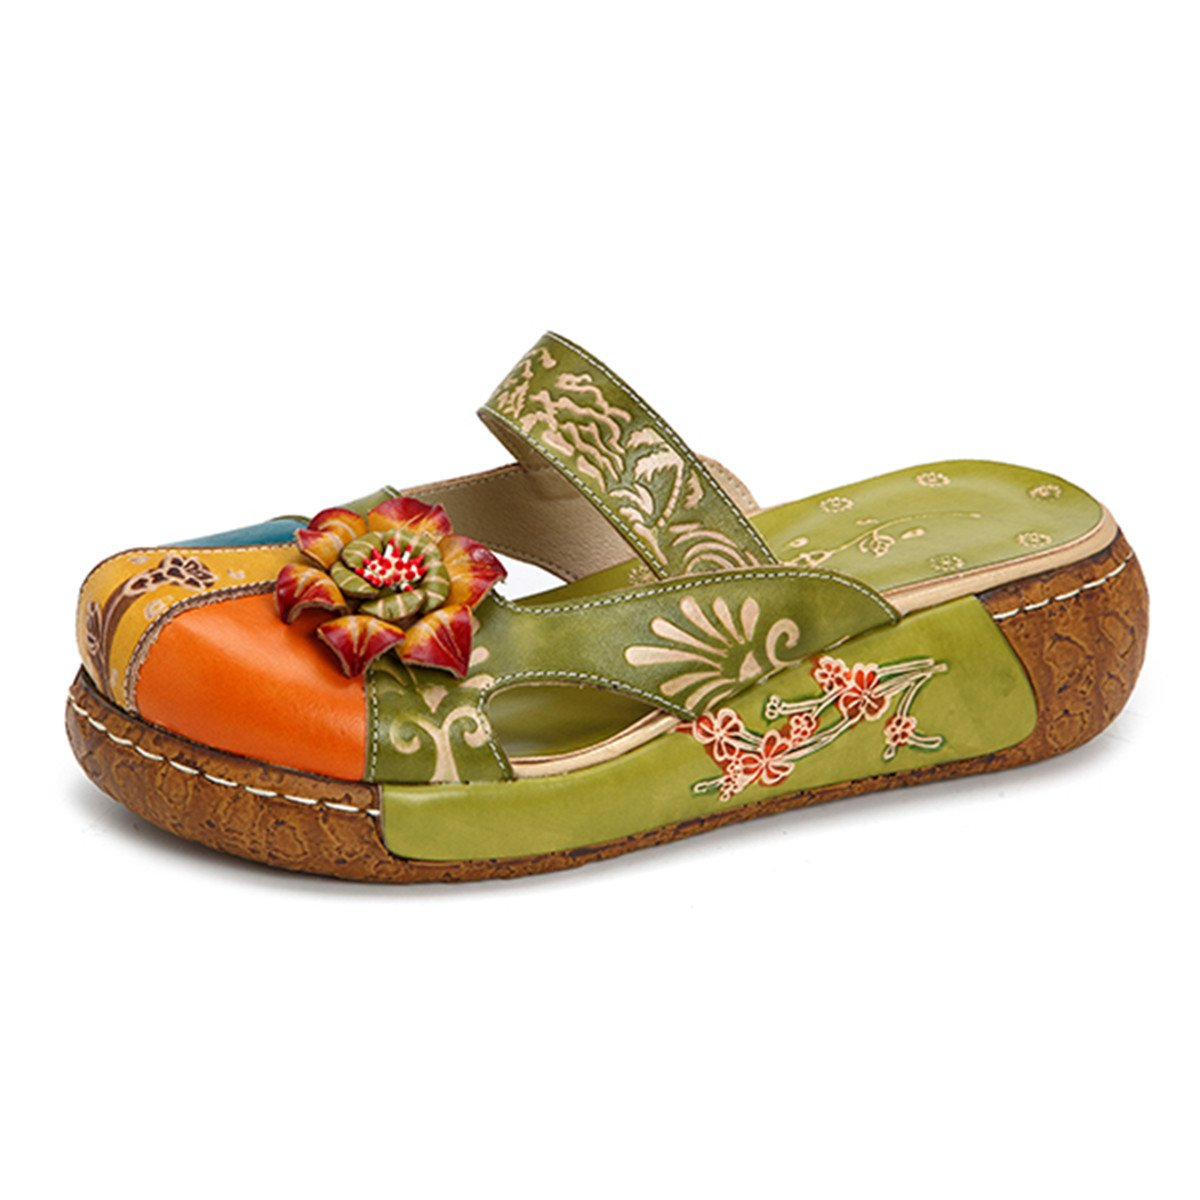 Gracosy Damen Sandalen, Sommer Leder Pantoffel Vintage Blume Slipper Rückenfrei Clogs Bunte Blume Vintage Schuhe Weich Komfortabel  38 EU|Grün d636fb